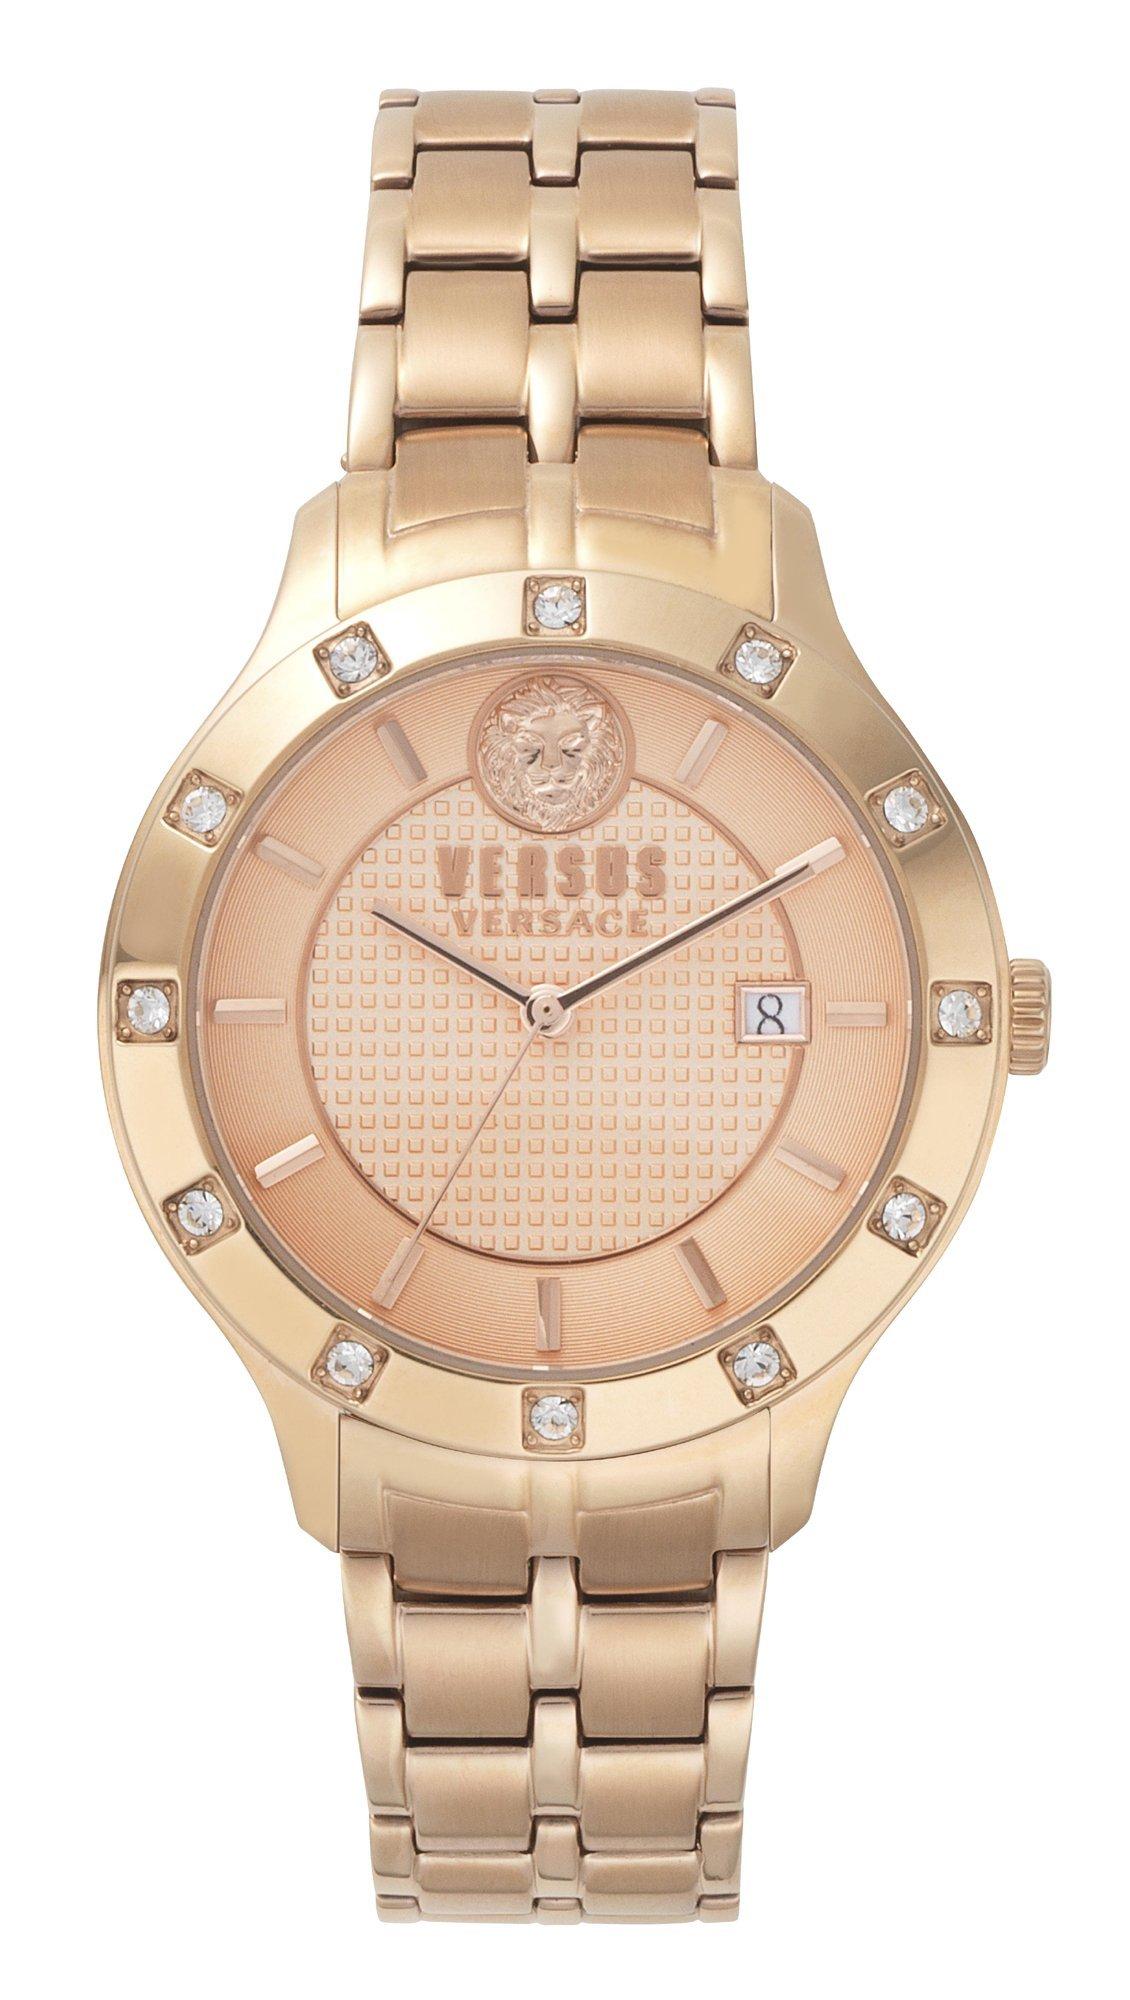 4443d93936 Versus Versace Ρολόι Versus by Versace με ροζ χρυσό μπρασελέ και ημερομηνία  VSP460418